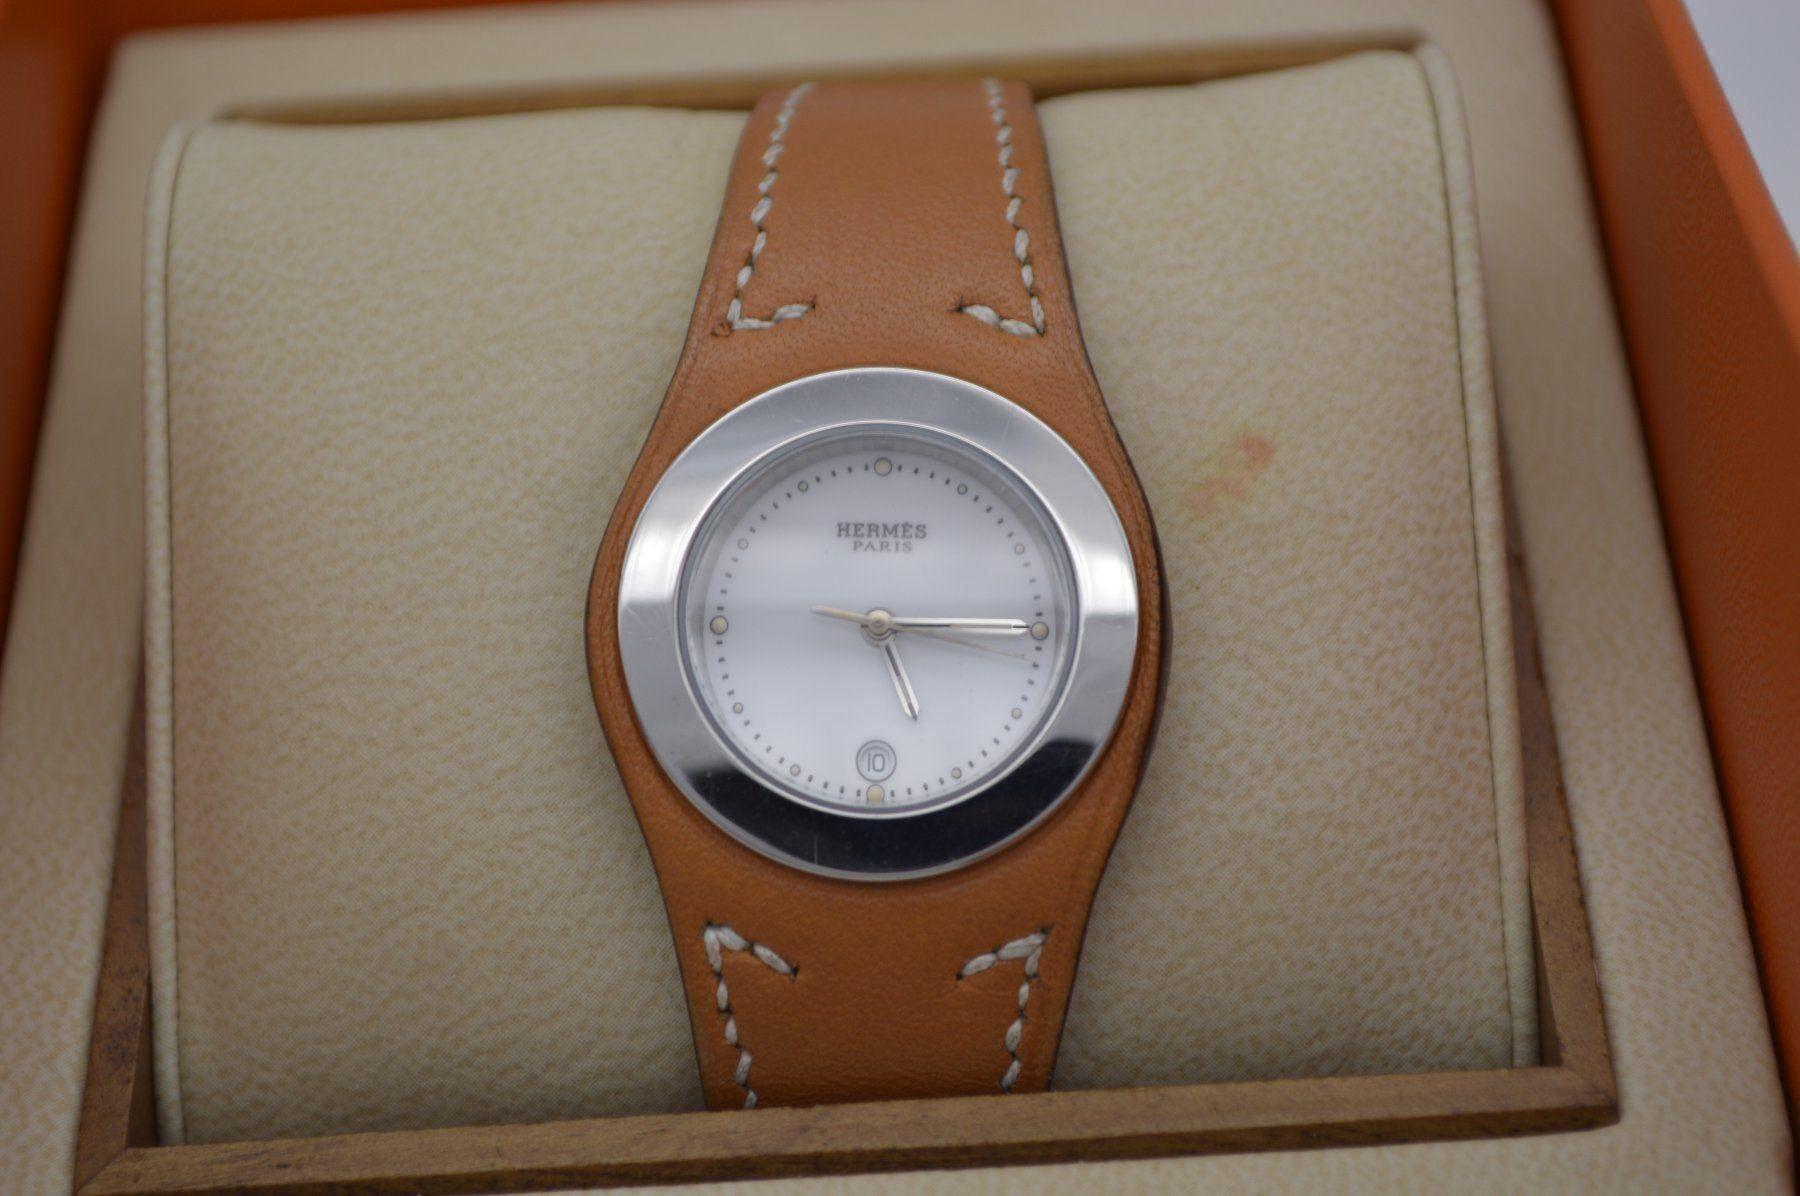 Herms / Harnais HA3.210 - Lady's Steel Wrist Watch - Image 2 of 6